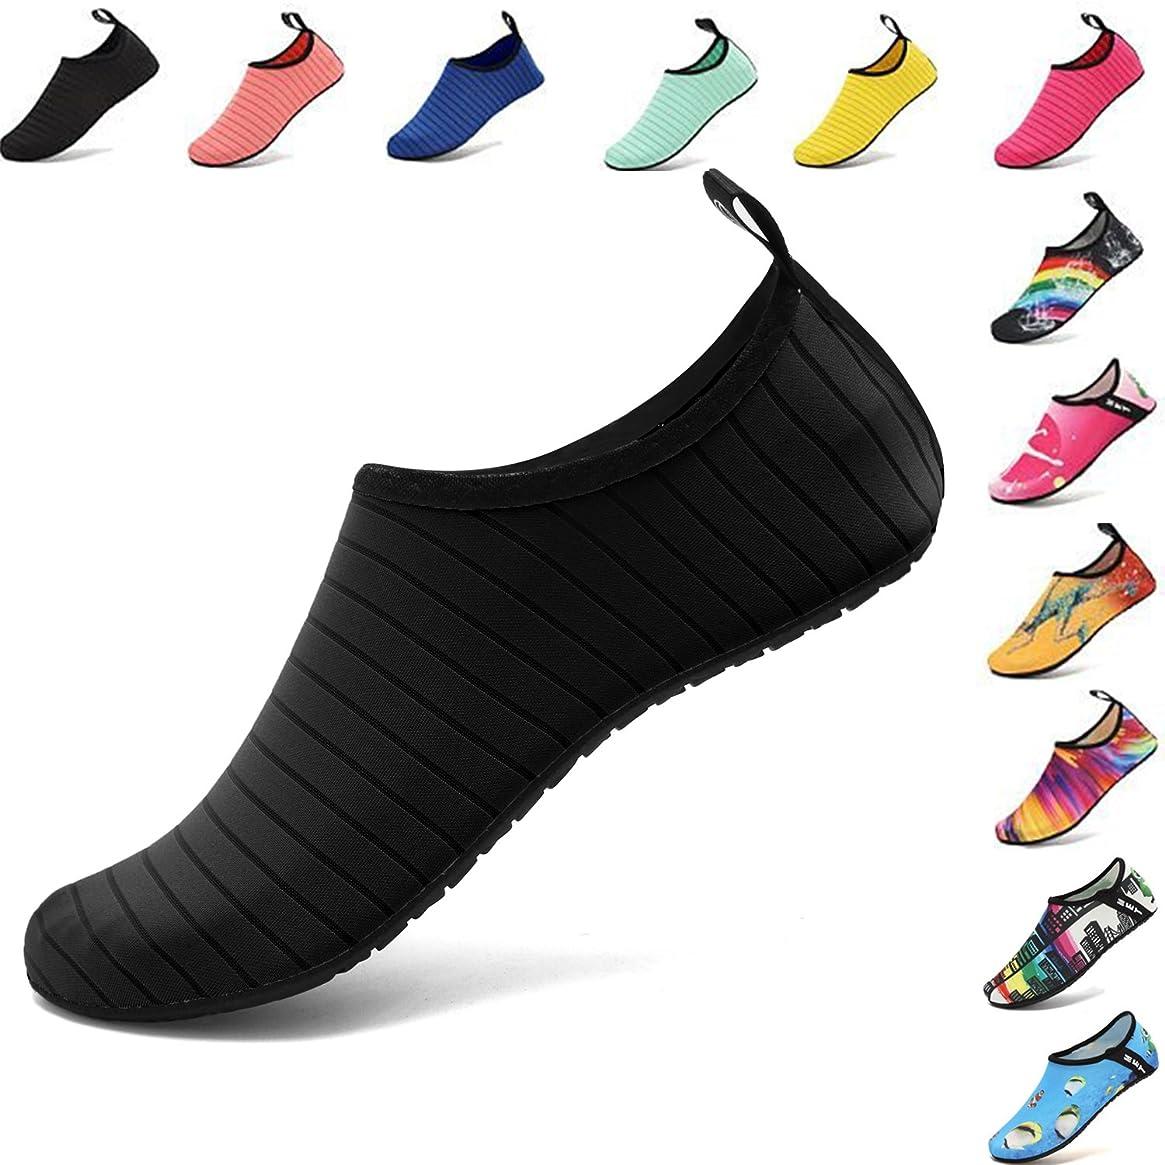 VIFUUR Water Sports Shoes Barefoot Quick-Dry Aqua Yoga Socks Slip-on for Men Women Kids mkxdubplmm55928